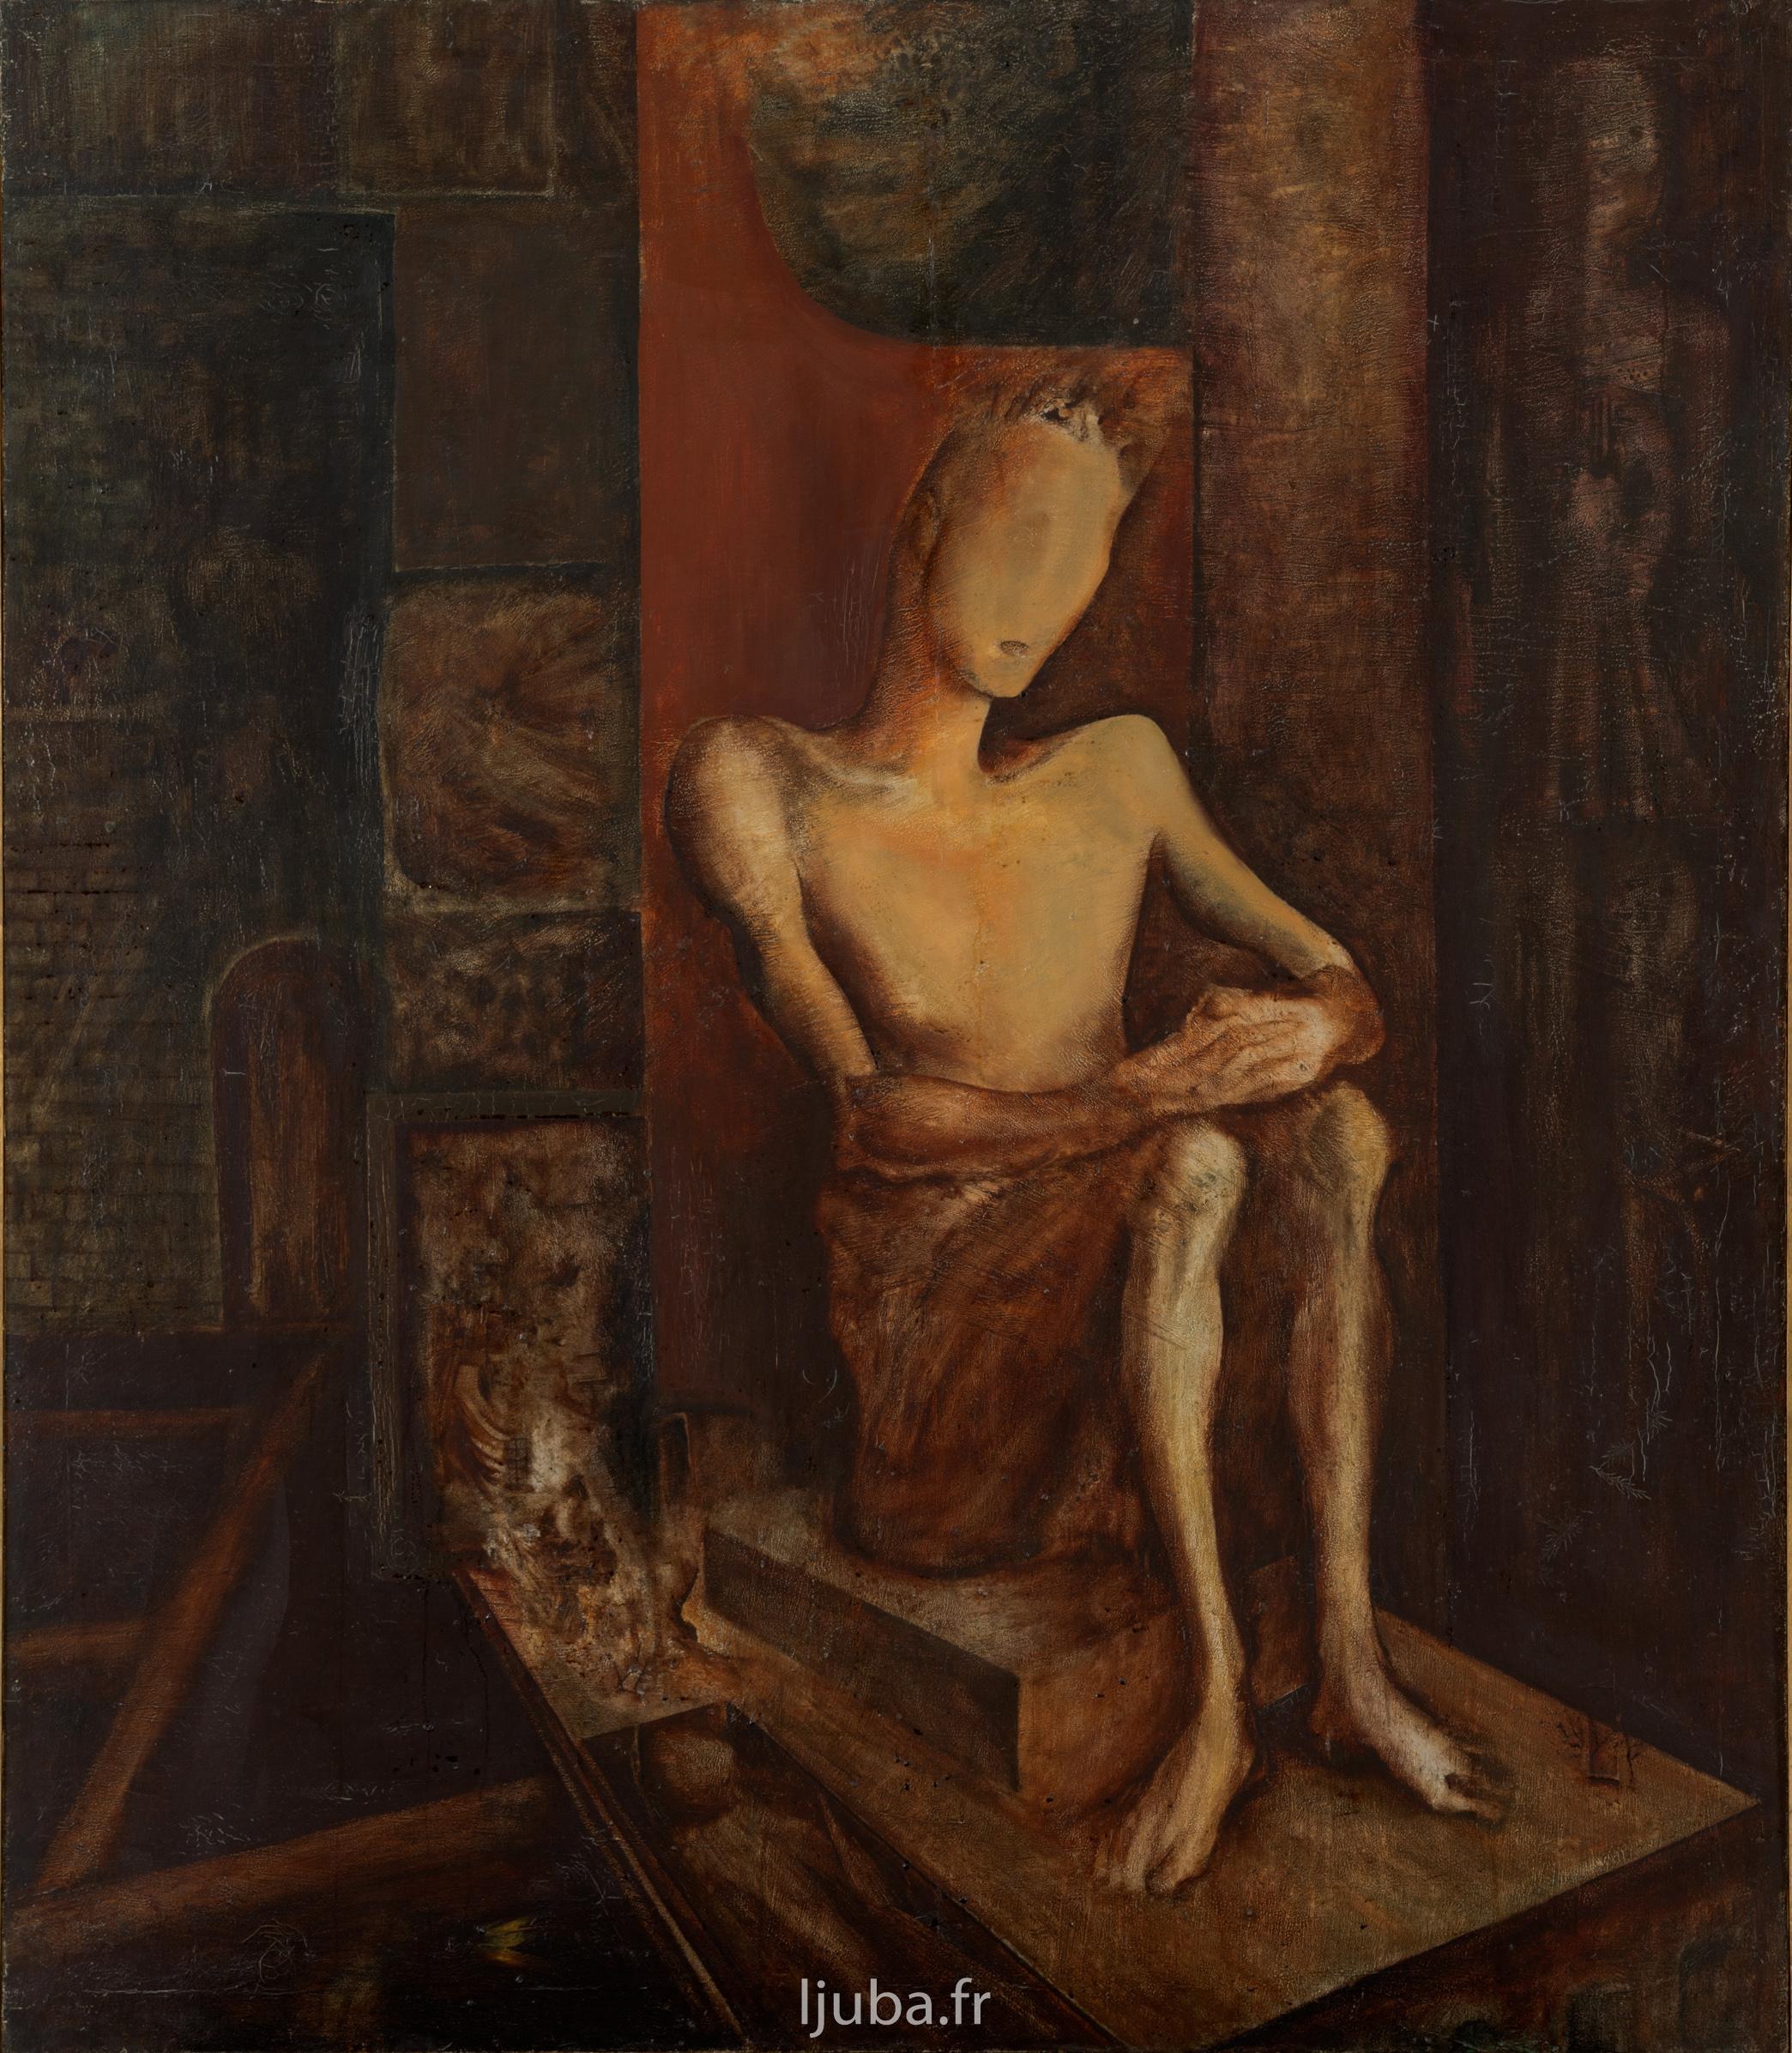 Ljuba Popovic - 1959, Le gardien de la coupole